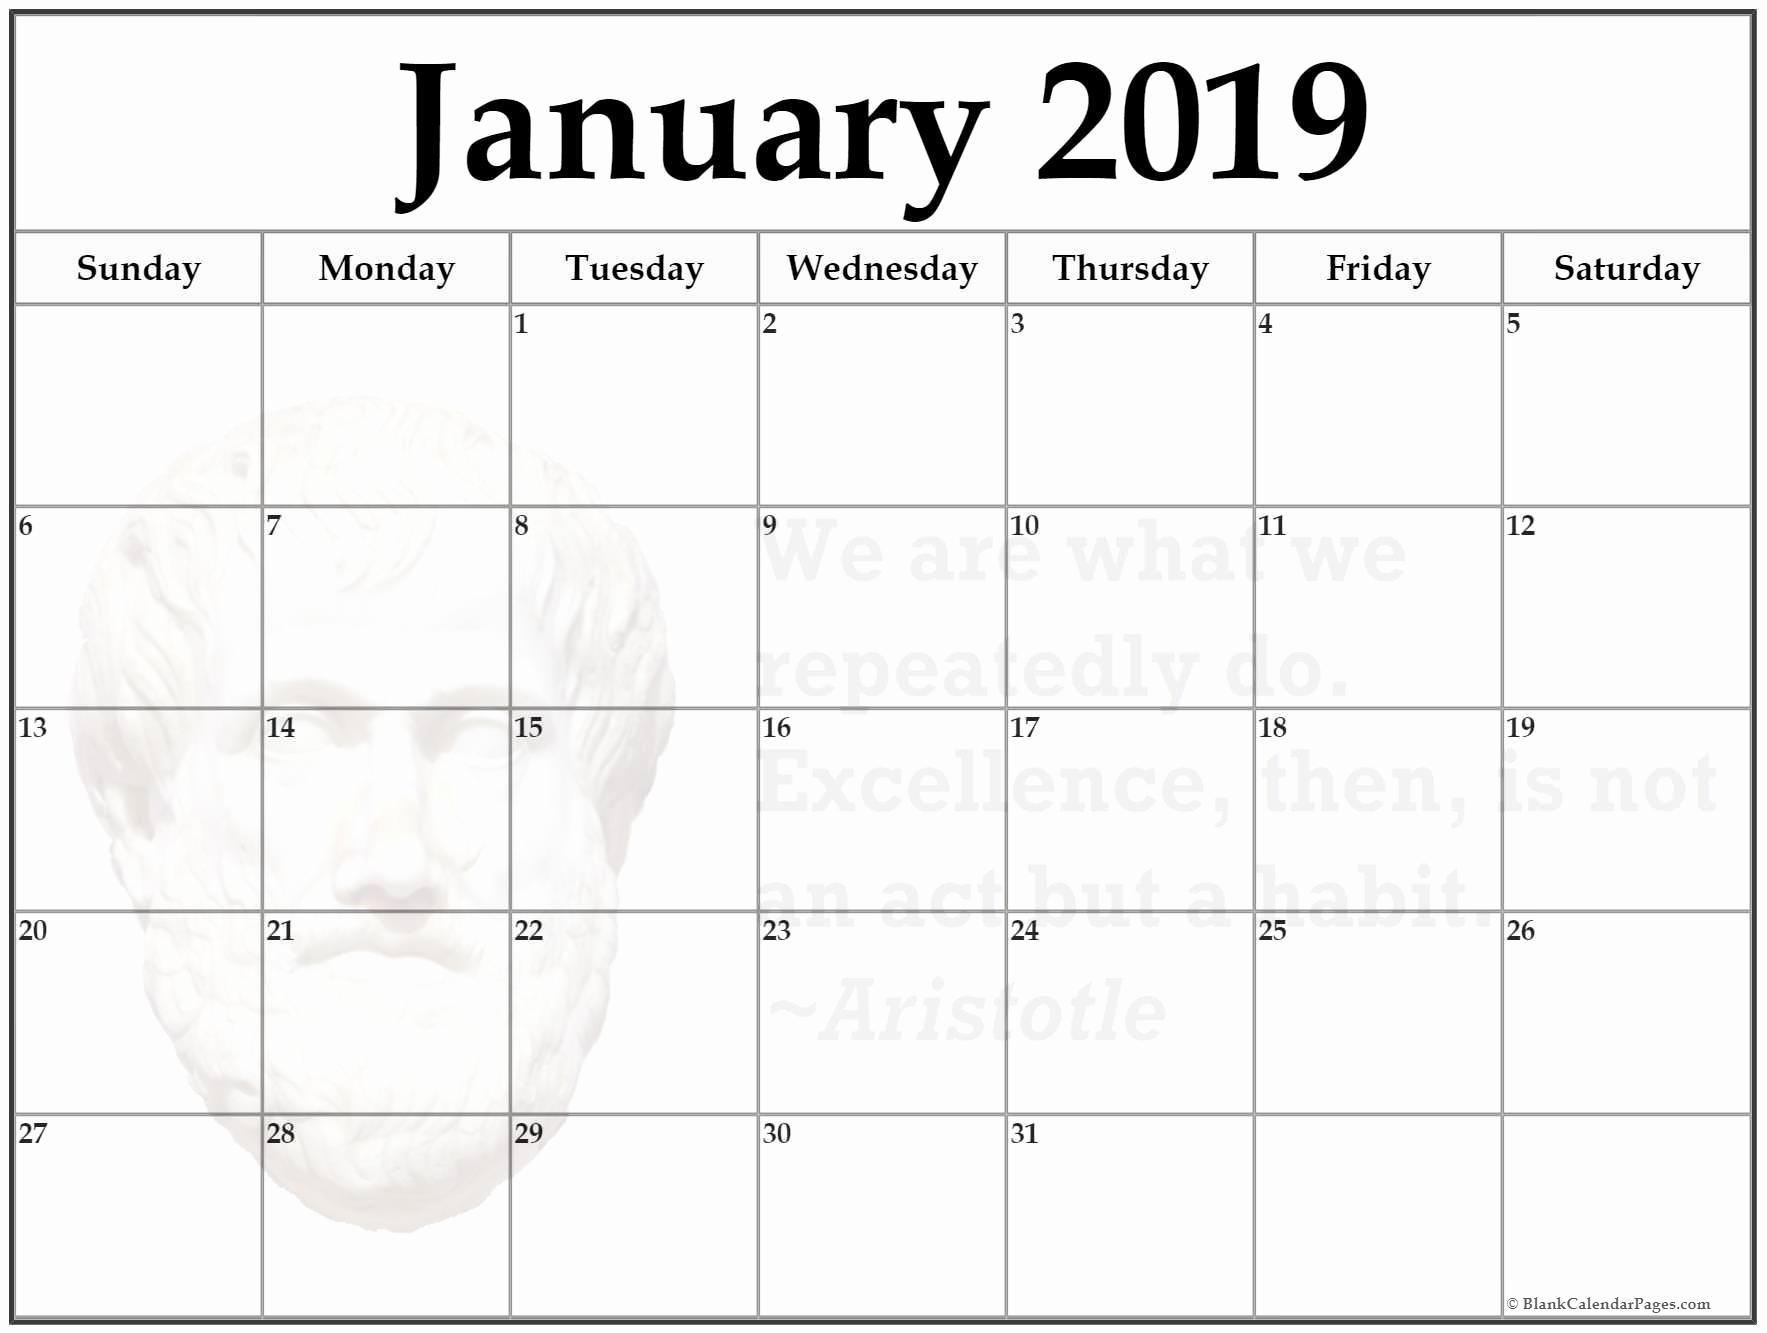 January 2019 Blank Printable Calendar 24 January 2019 Printable regarding Full Size Blank Printable Calendar